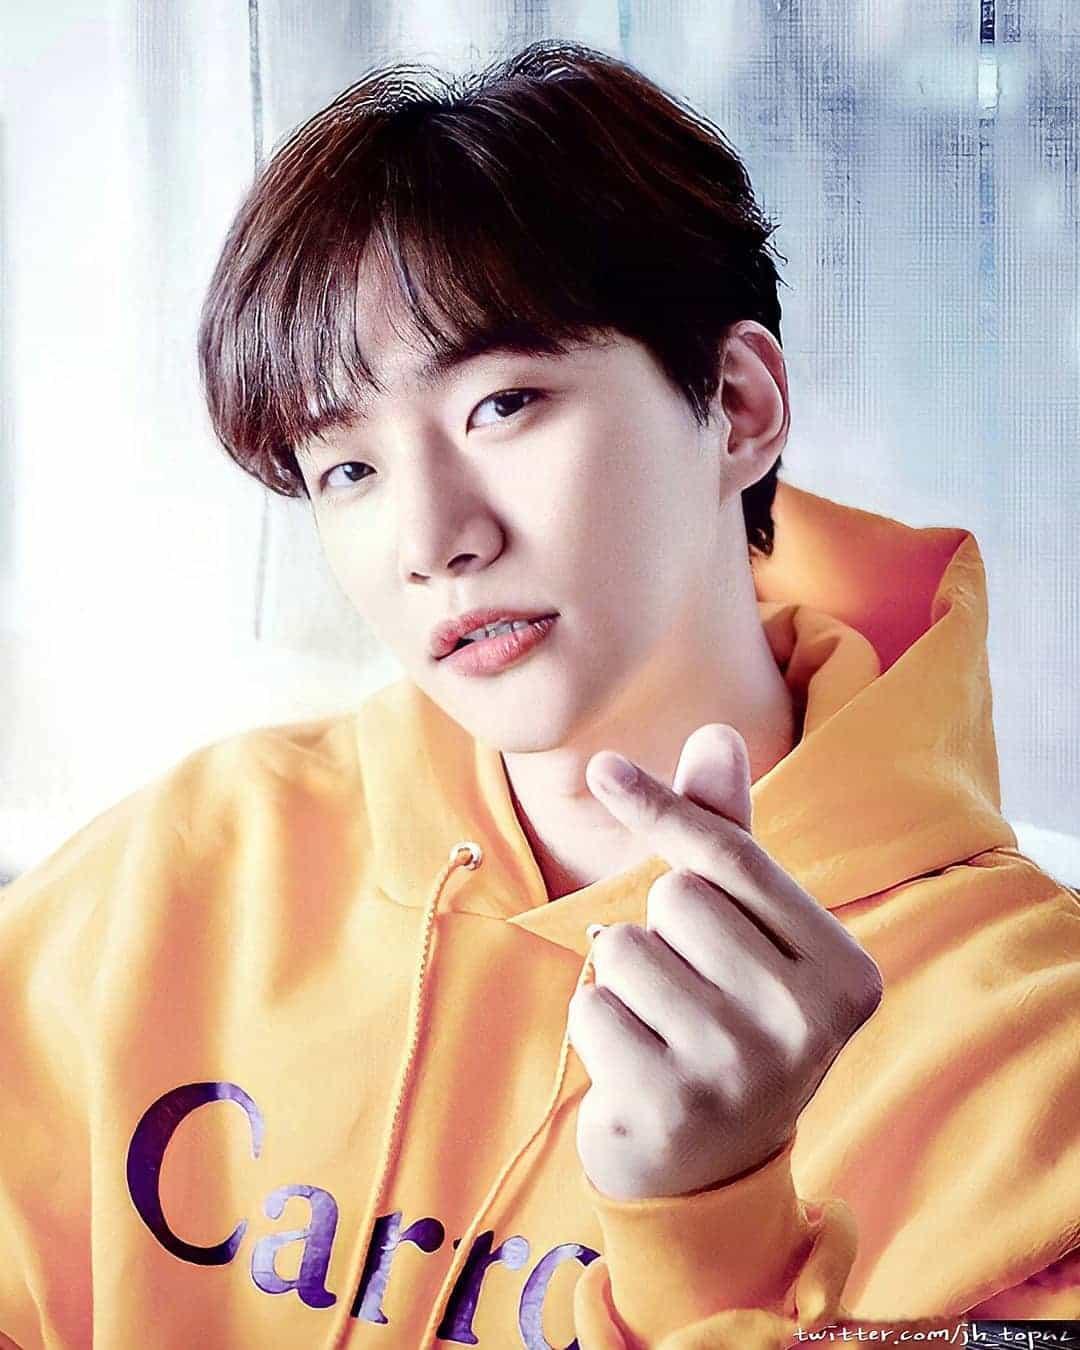 Nama Panggilan Dalam Bahasa Korea : panggilan, dalam, bahasa, korea, Panggilan, Dalam, Bahasa, Korea,, Banyak, Dipakai, Drakor, KASKUS